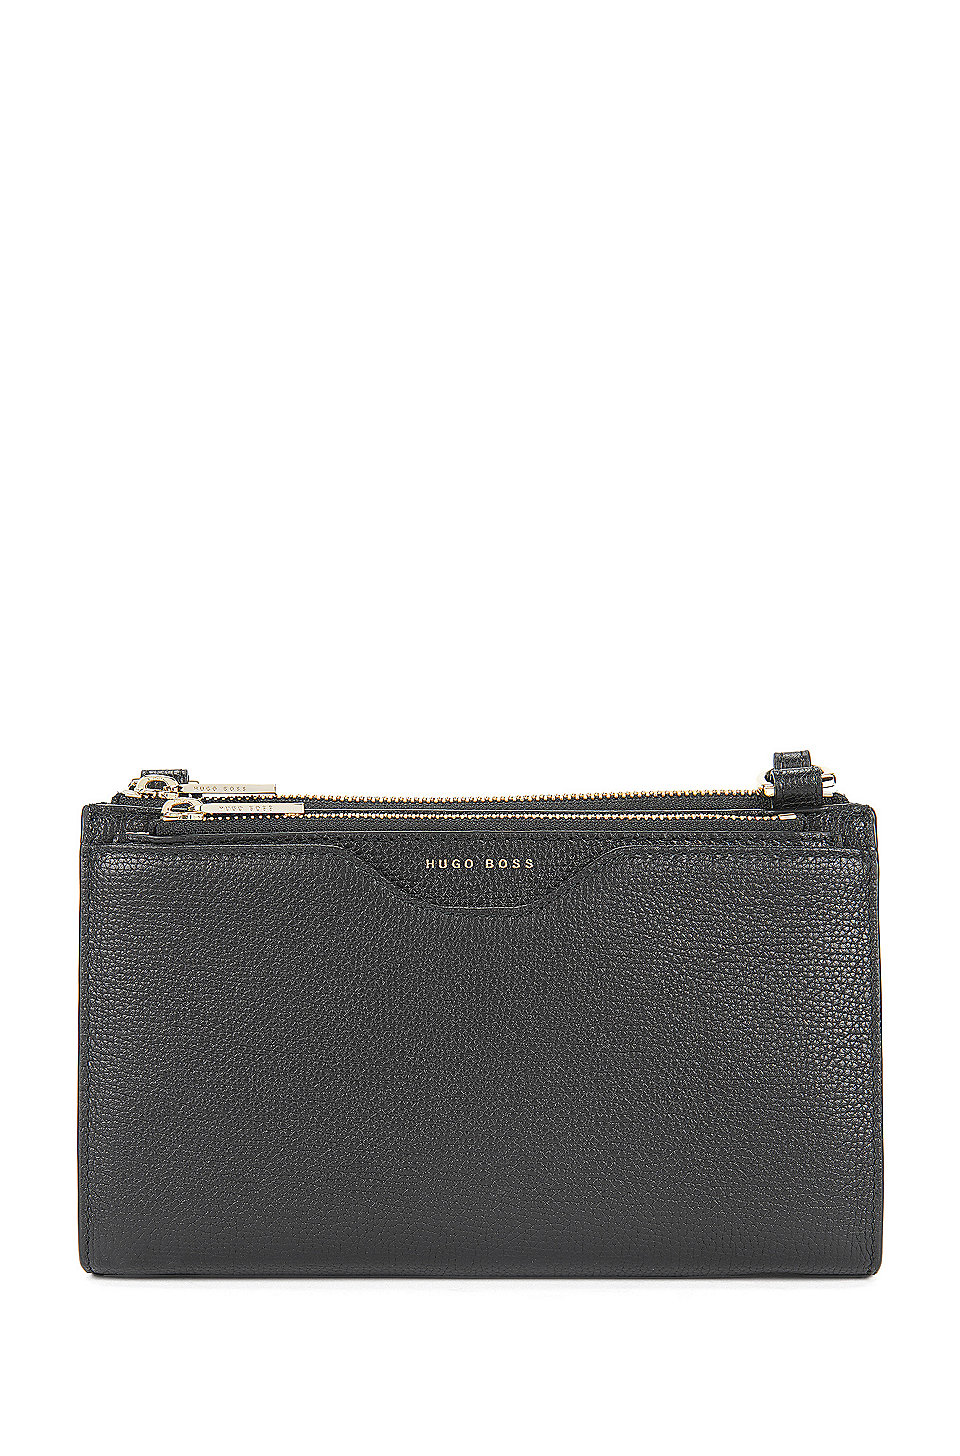 2df0a7dc62ef3 BOSS - Kompakte Tasche aus genarbtem italienischem Leder